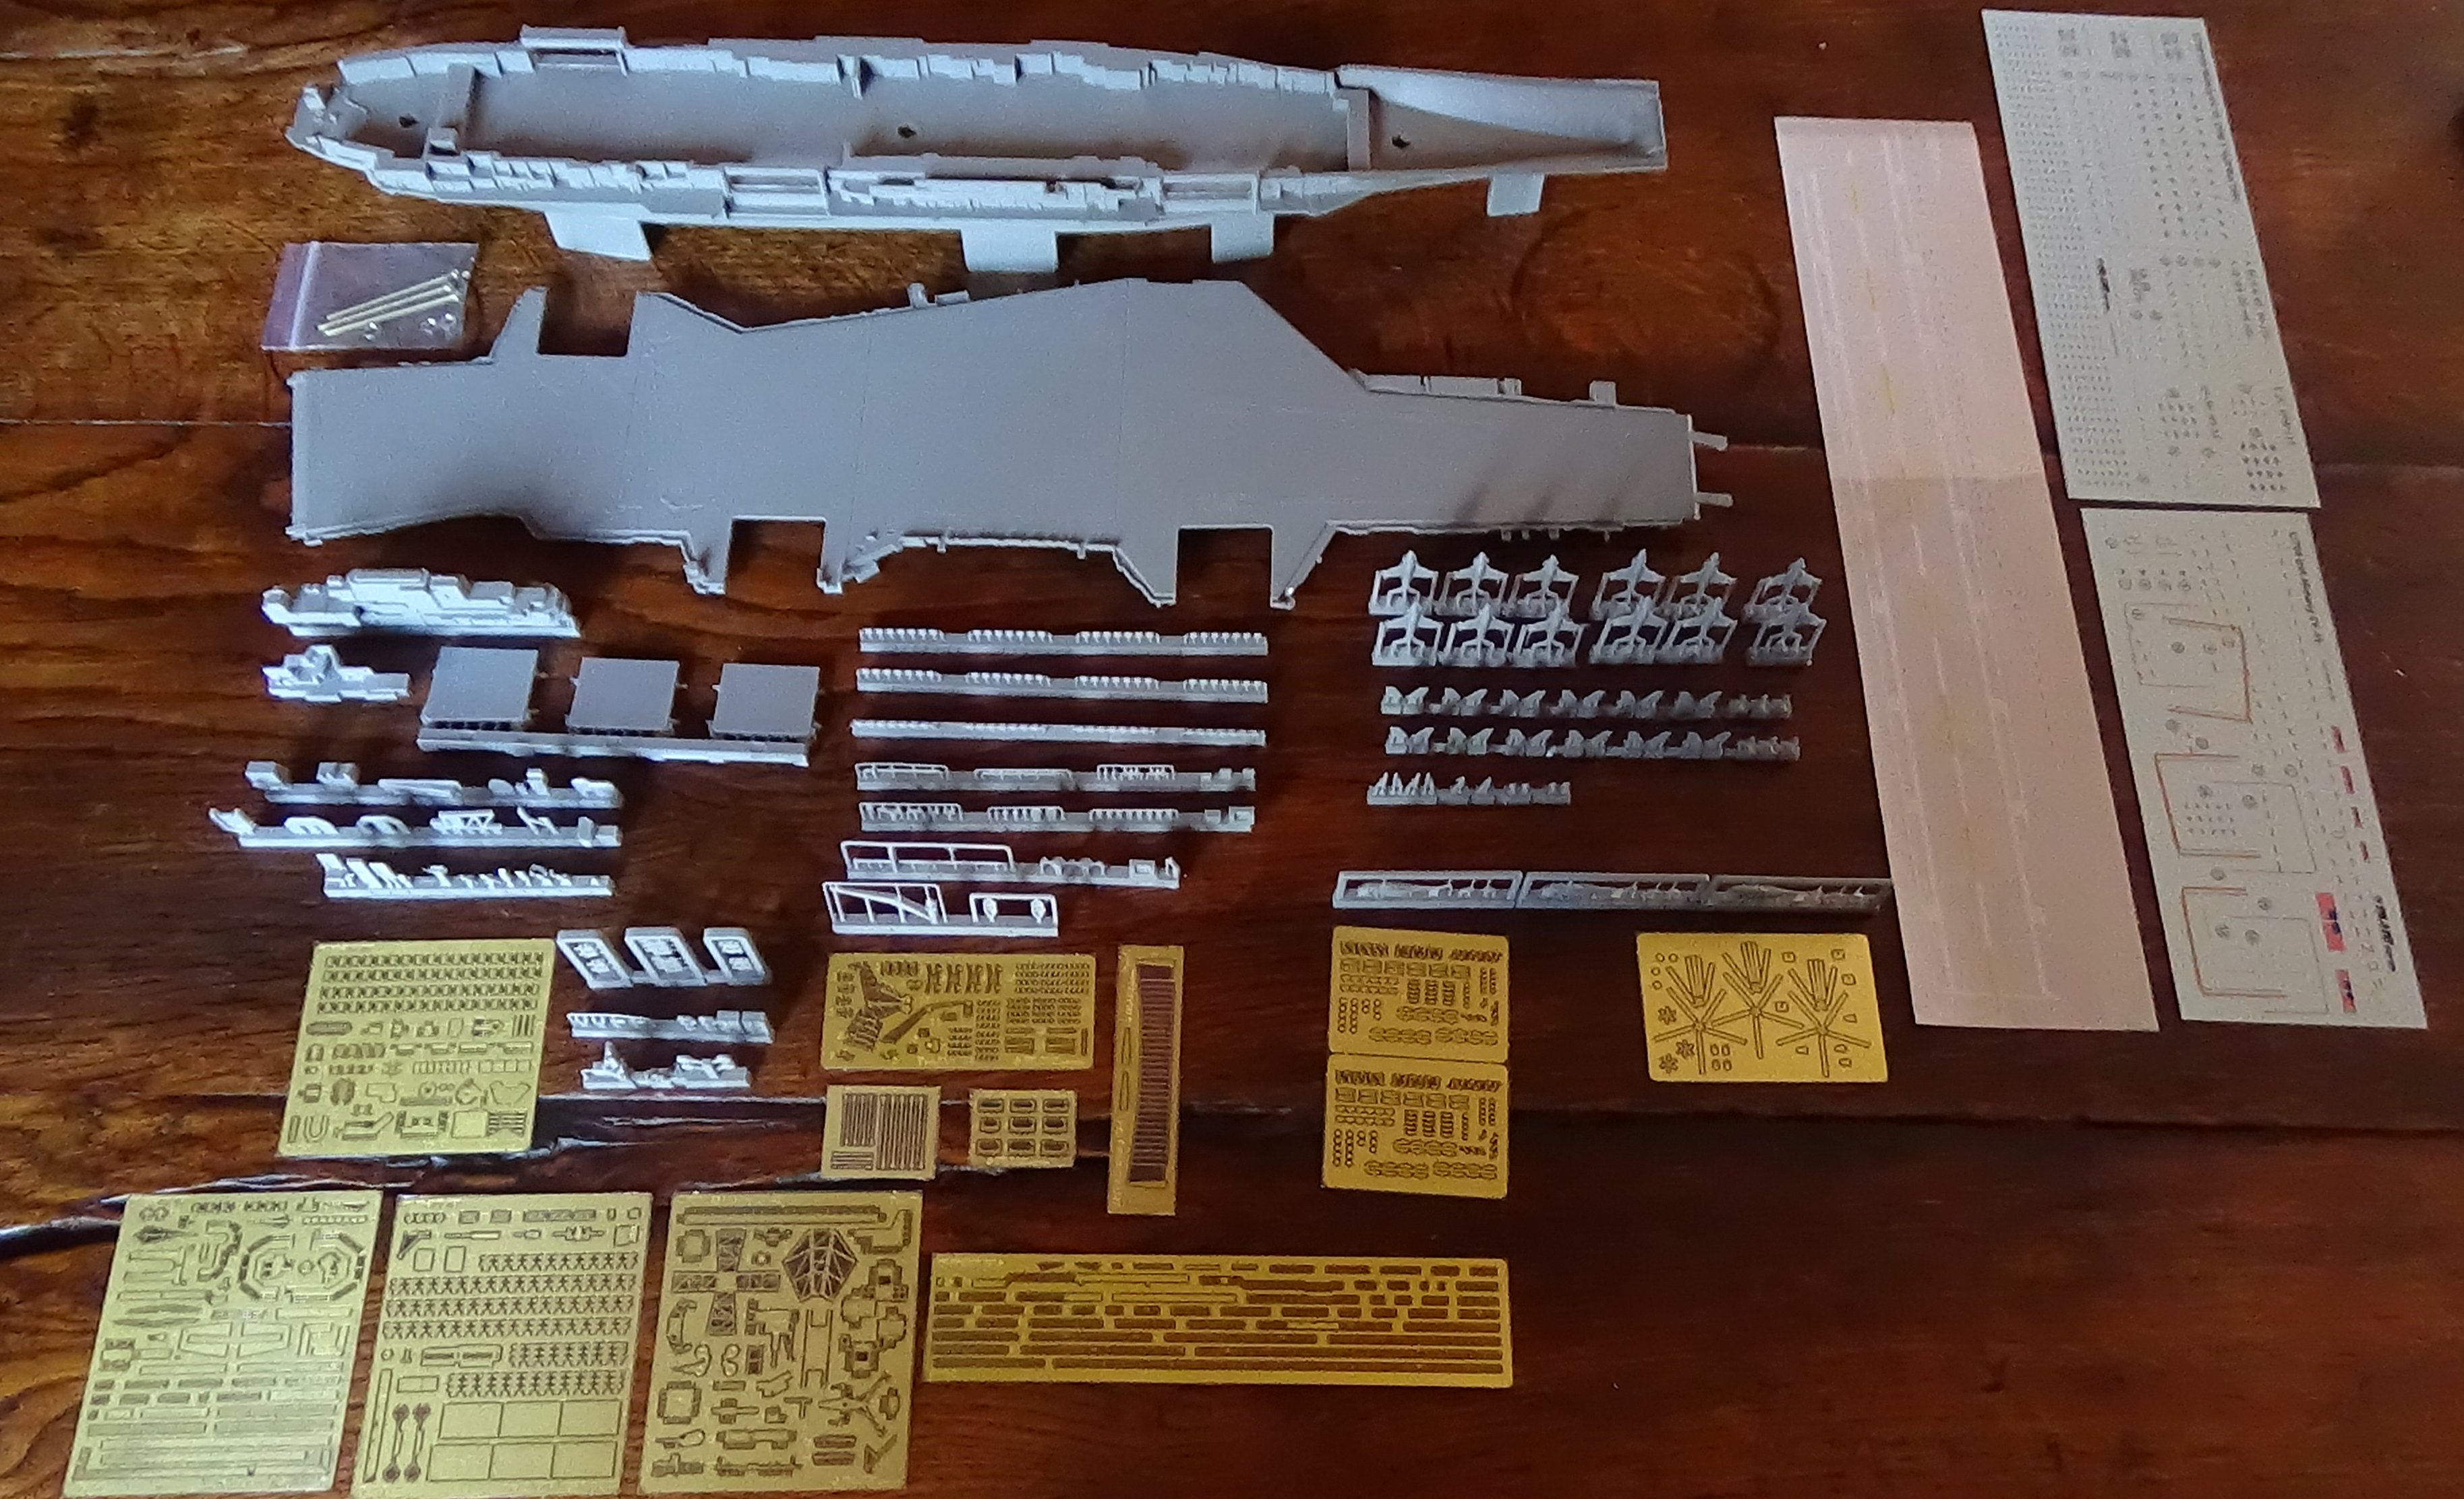 [USS Midway CVA-41] Porte avions lourd américain-700e-Orange Hobby 17071905020623134915155984